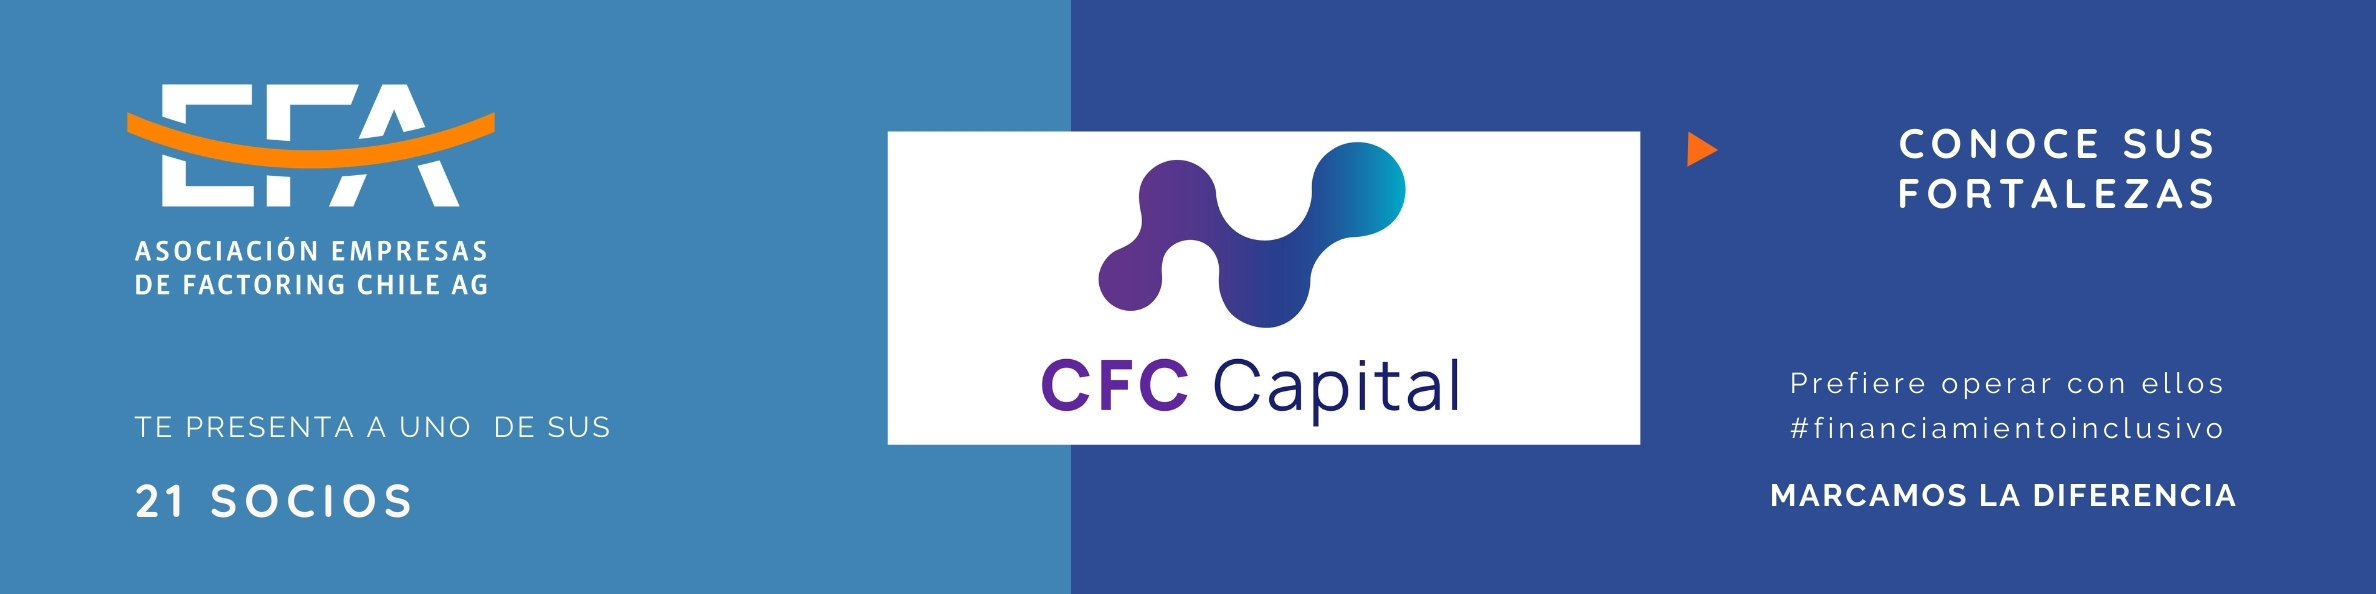 CFC CAPITAL